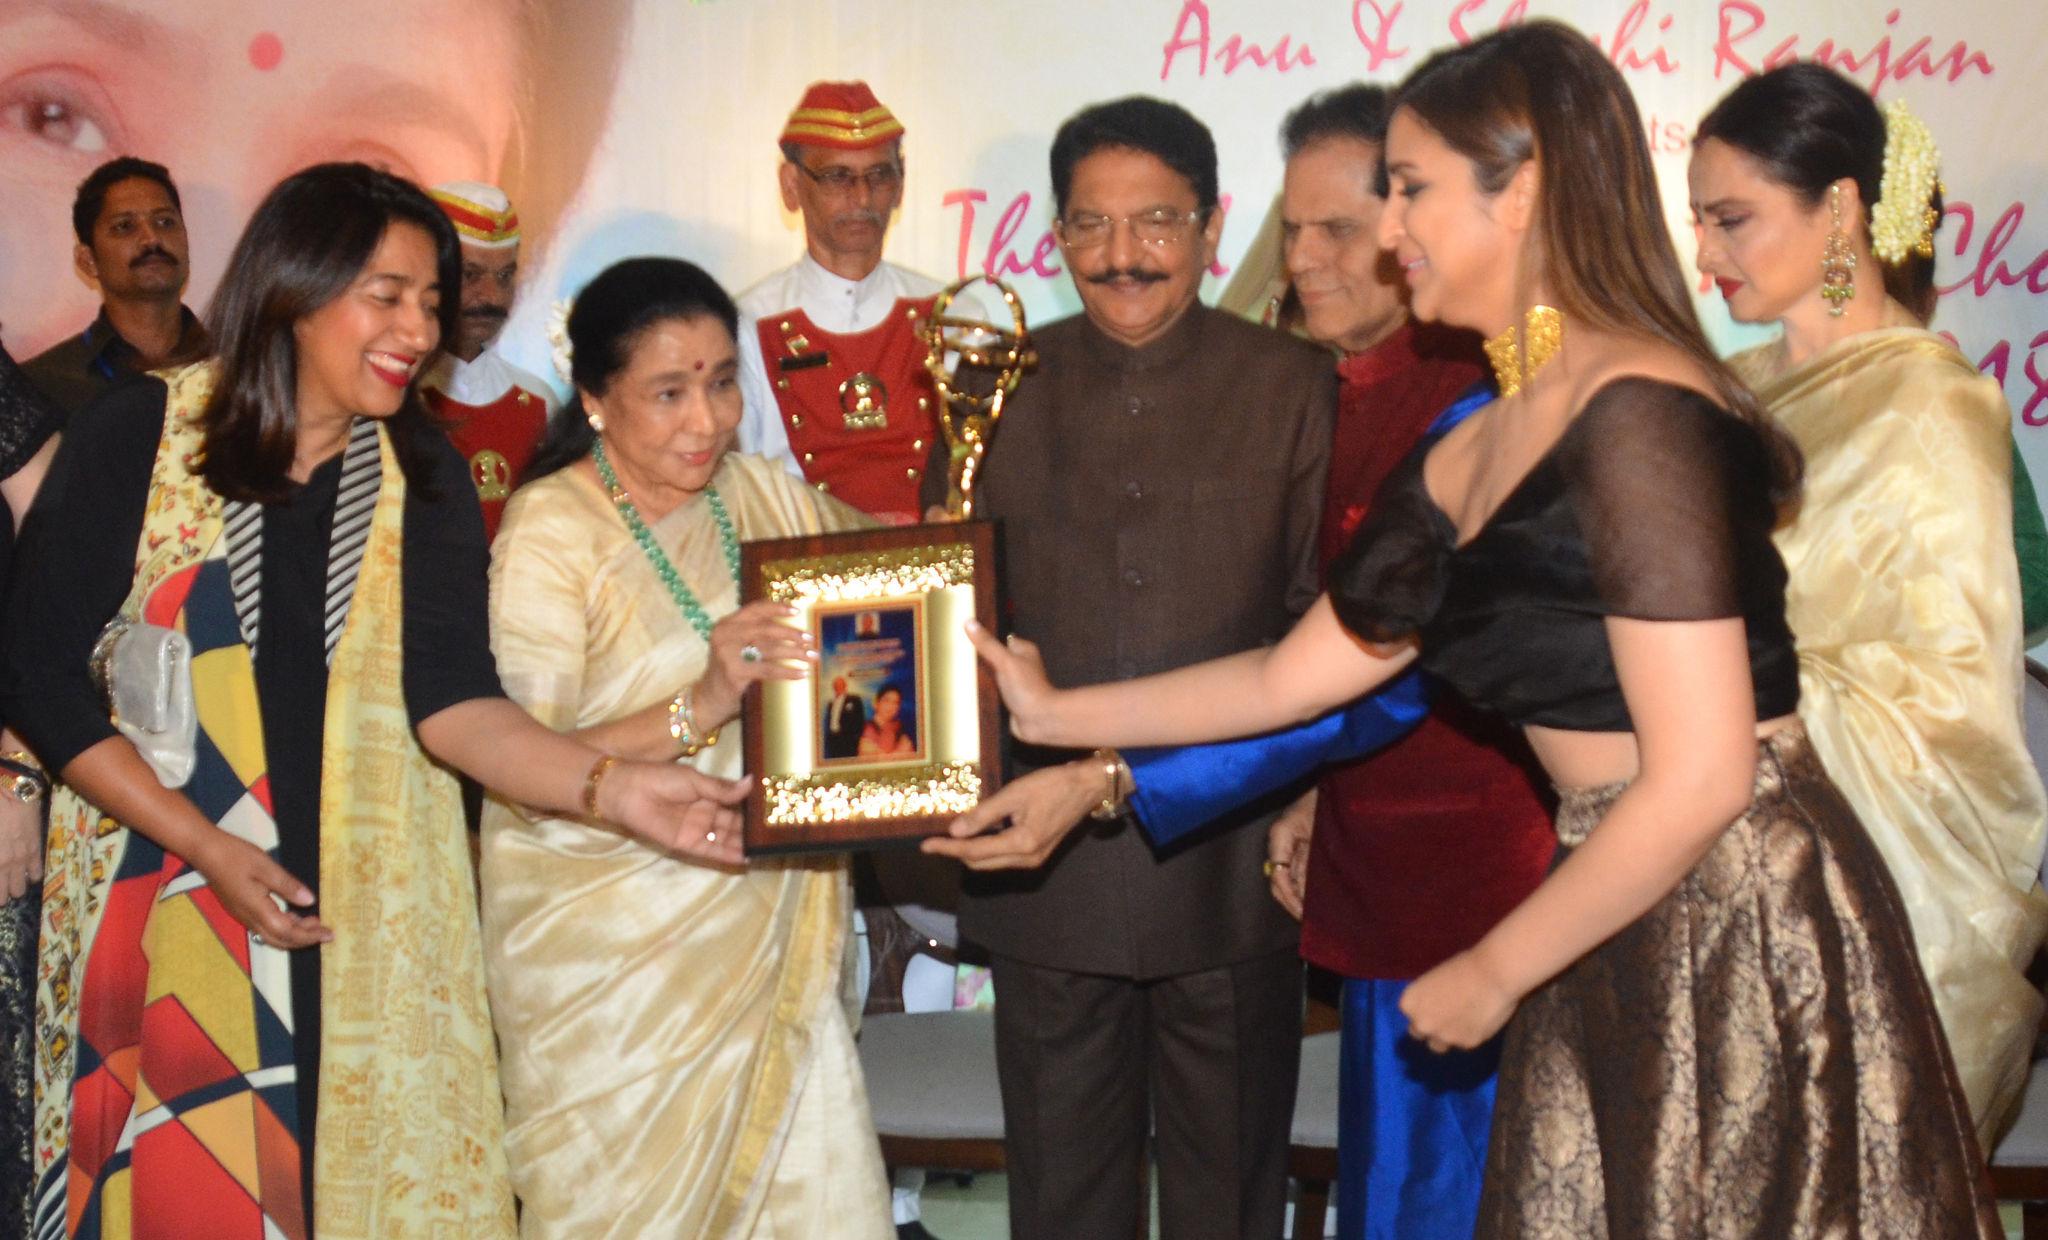 Singer Asha Bhosle receives 5th Yash Chopra National Memorial Award 2018